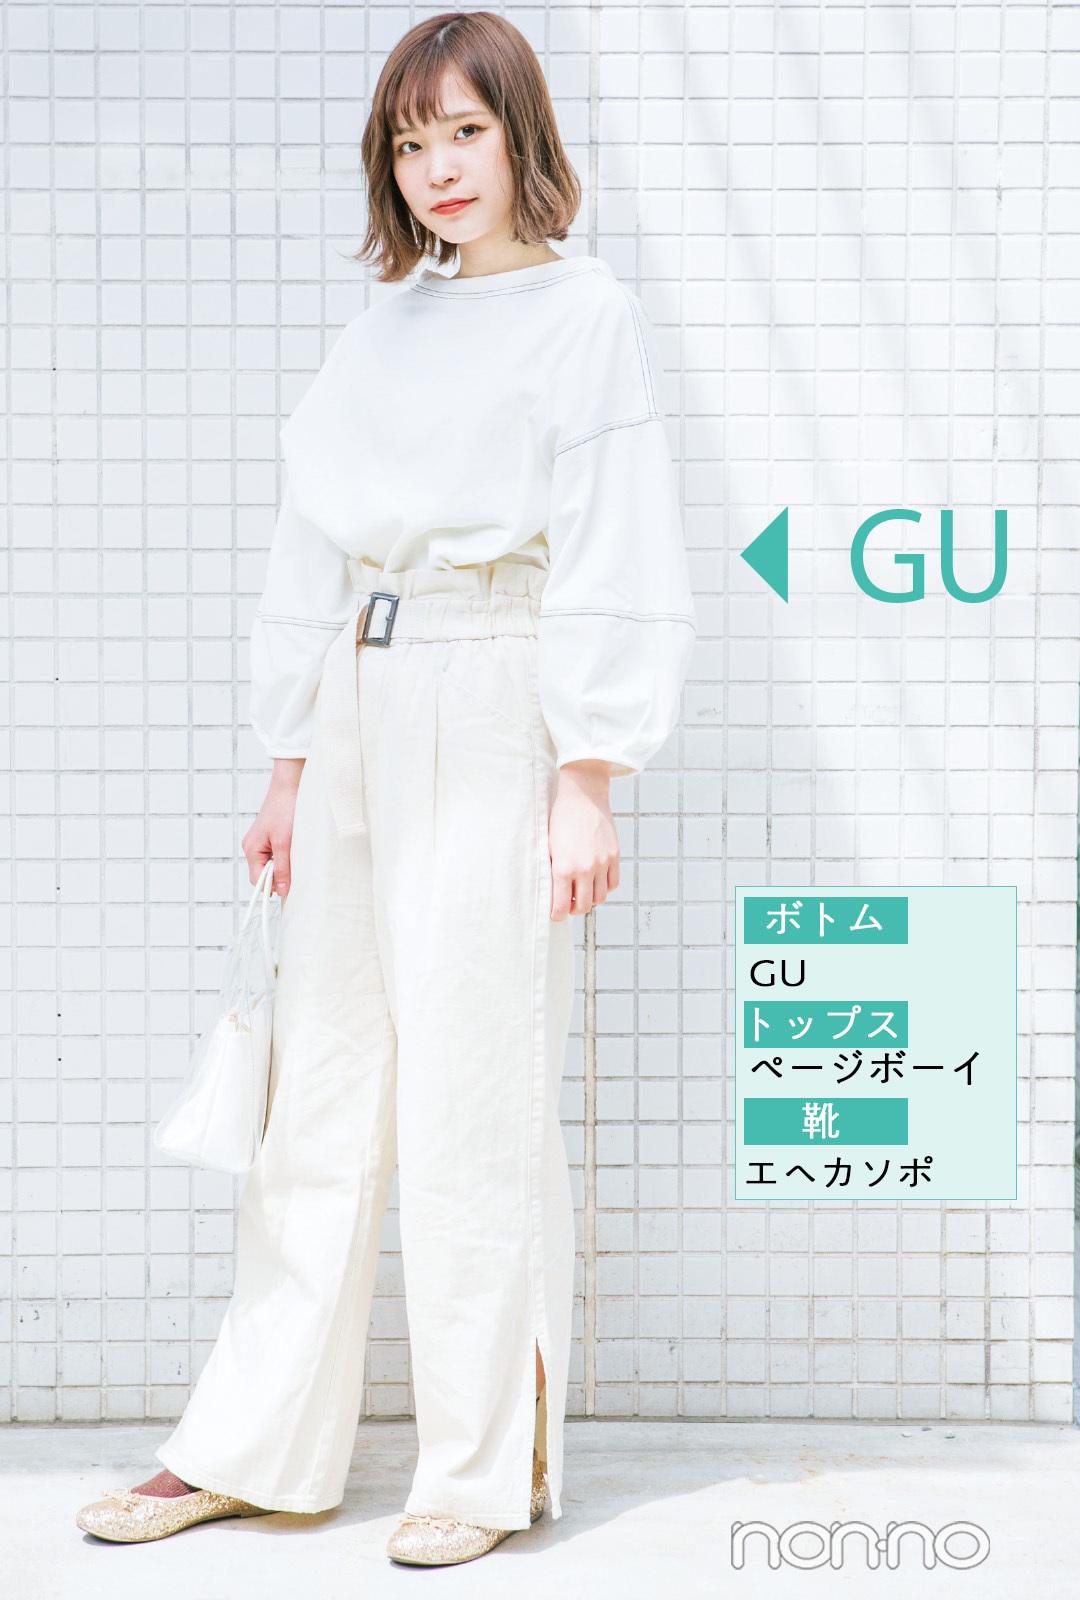 GUの新作コーデ★ ノンノ専属読者モデルはこう着る!【カワイイ選抜】_1_2